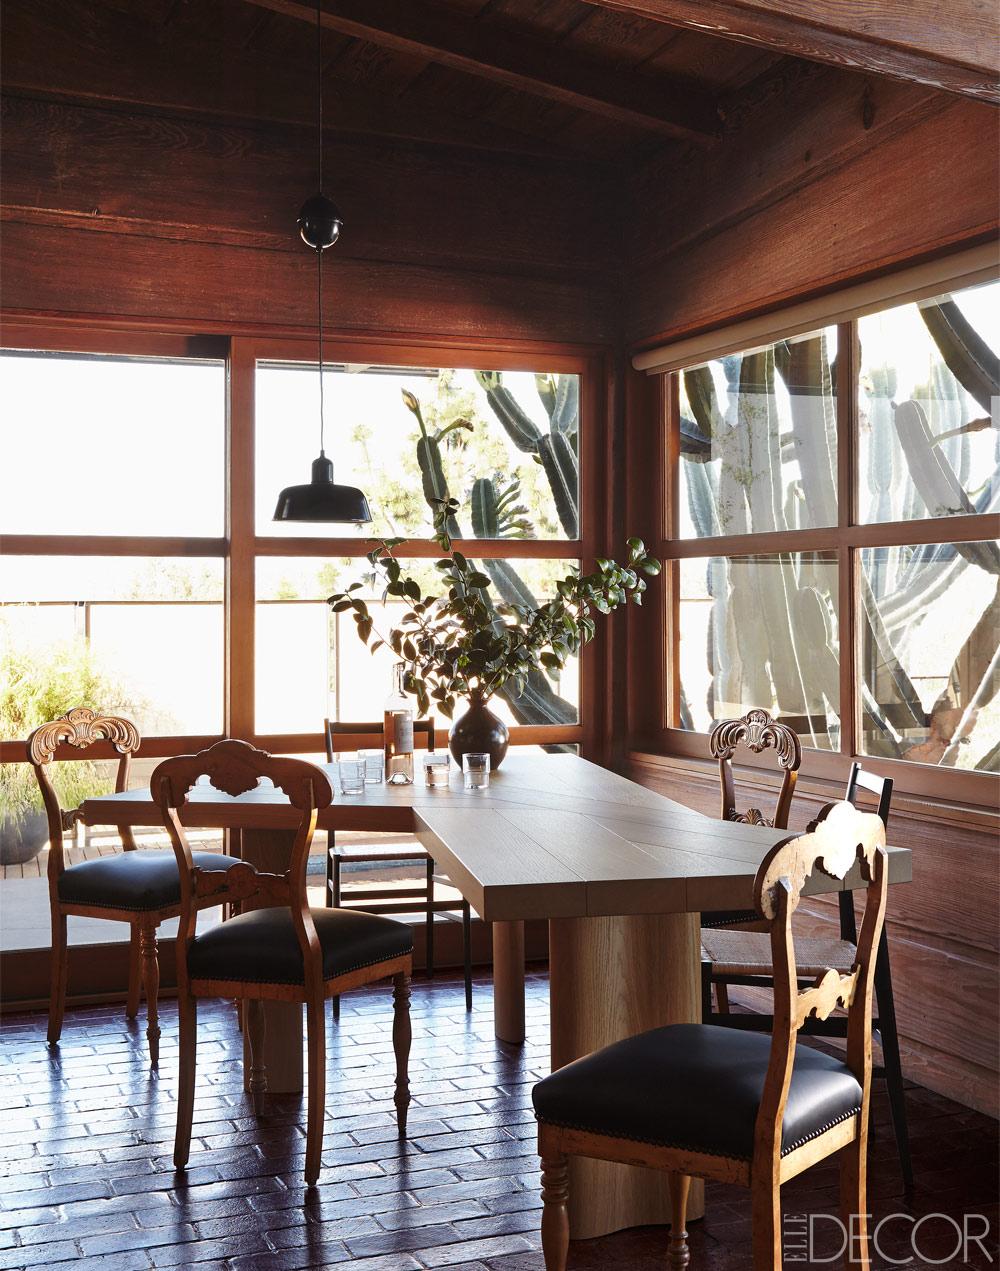 laurel-canyon-rozae-nichols-house-tour-04.jpg